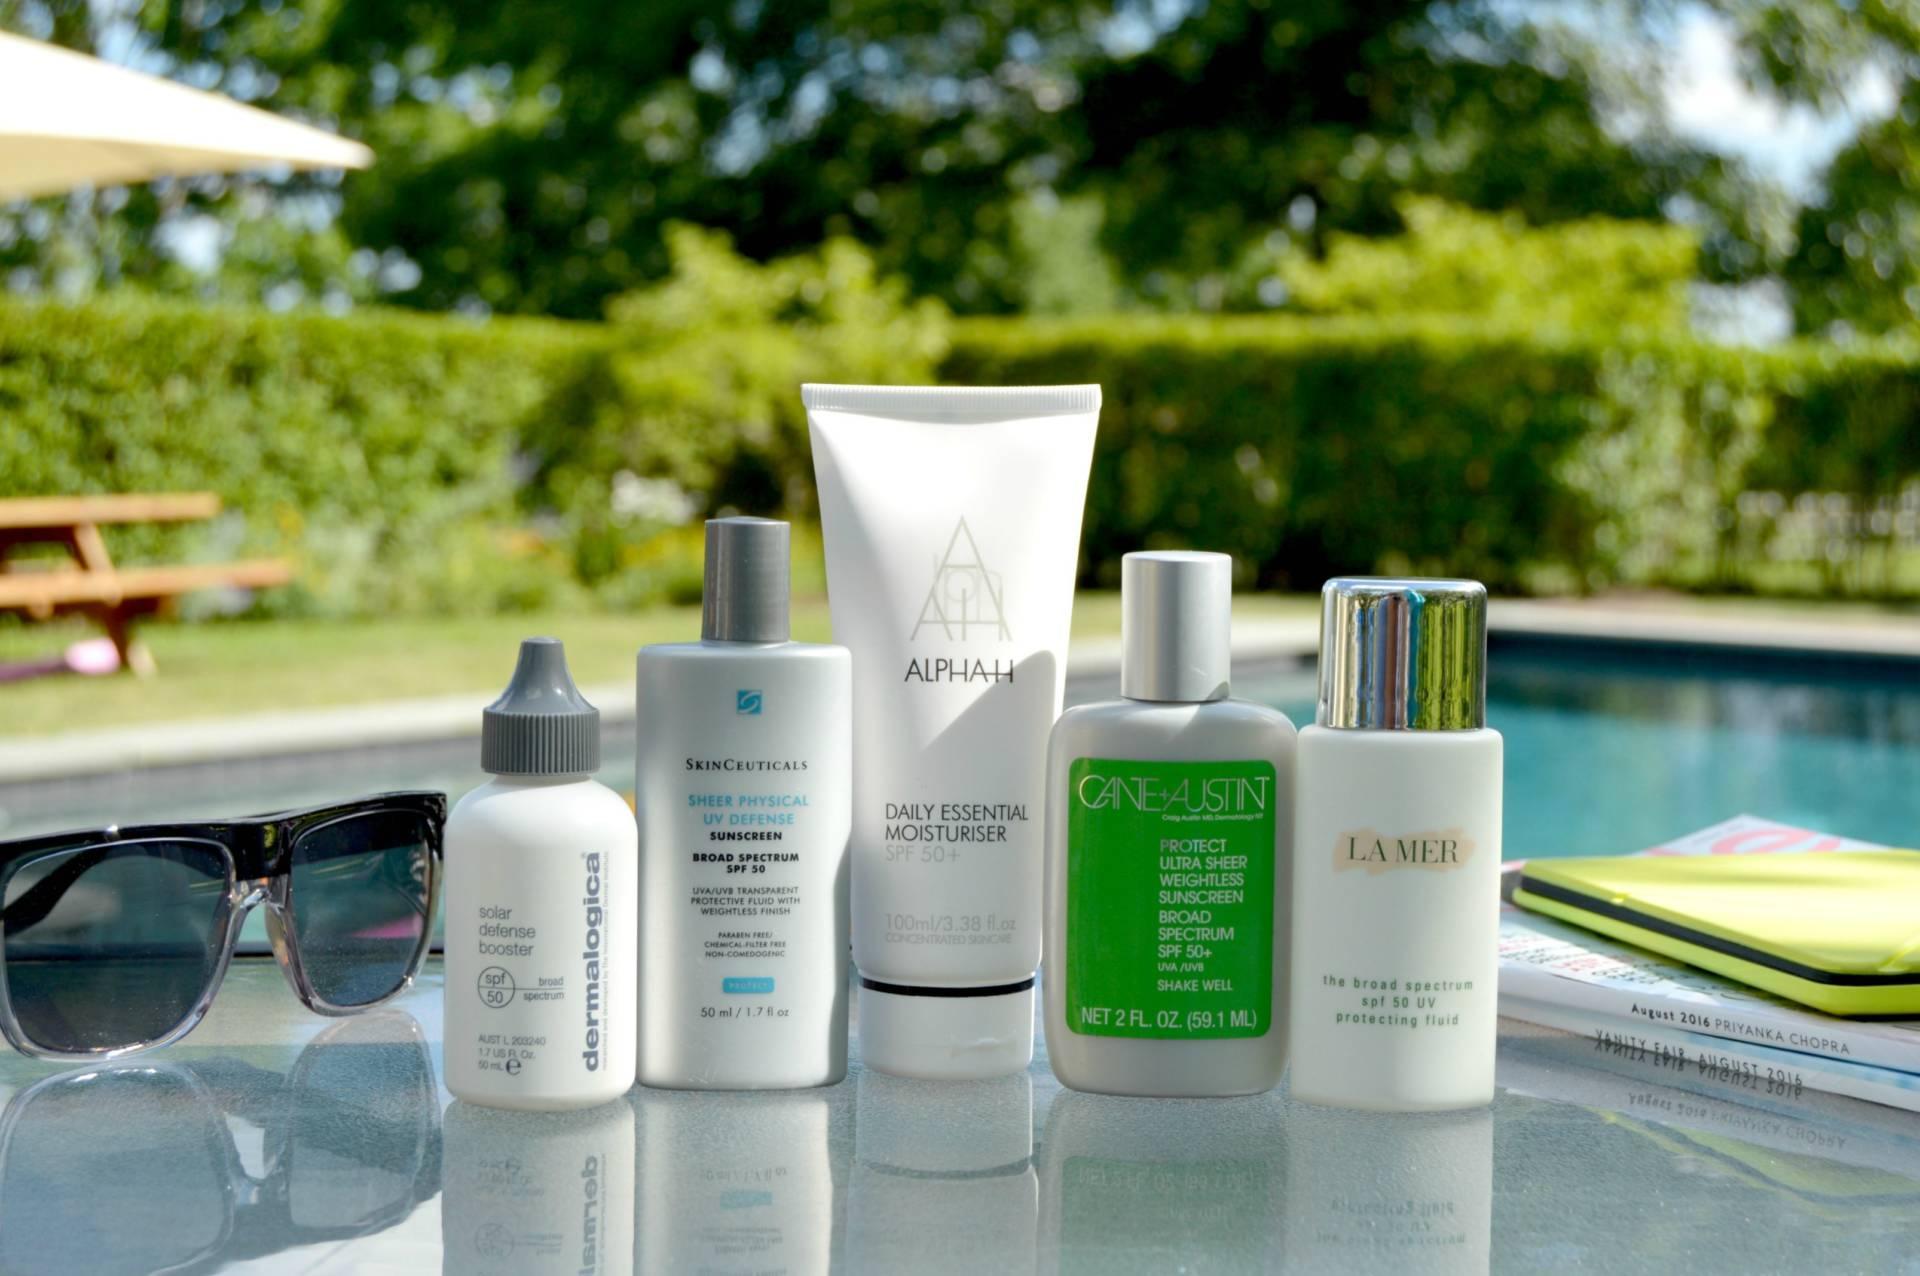 spf 50 for combination skin best of inhautepursuit edit face lotion cream